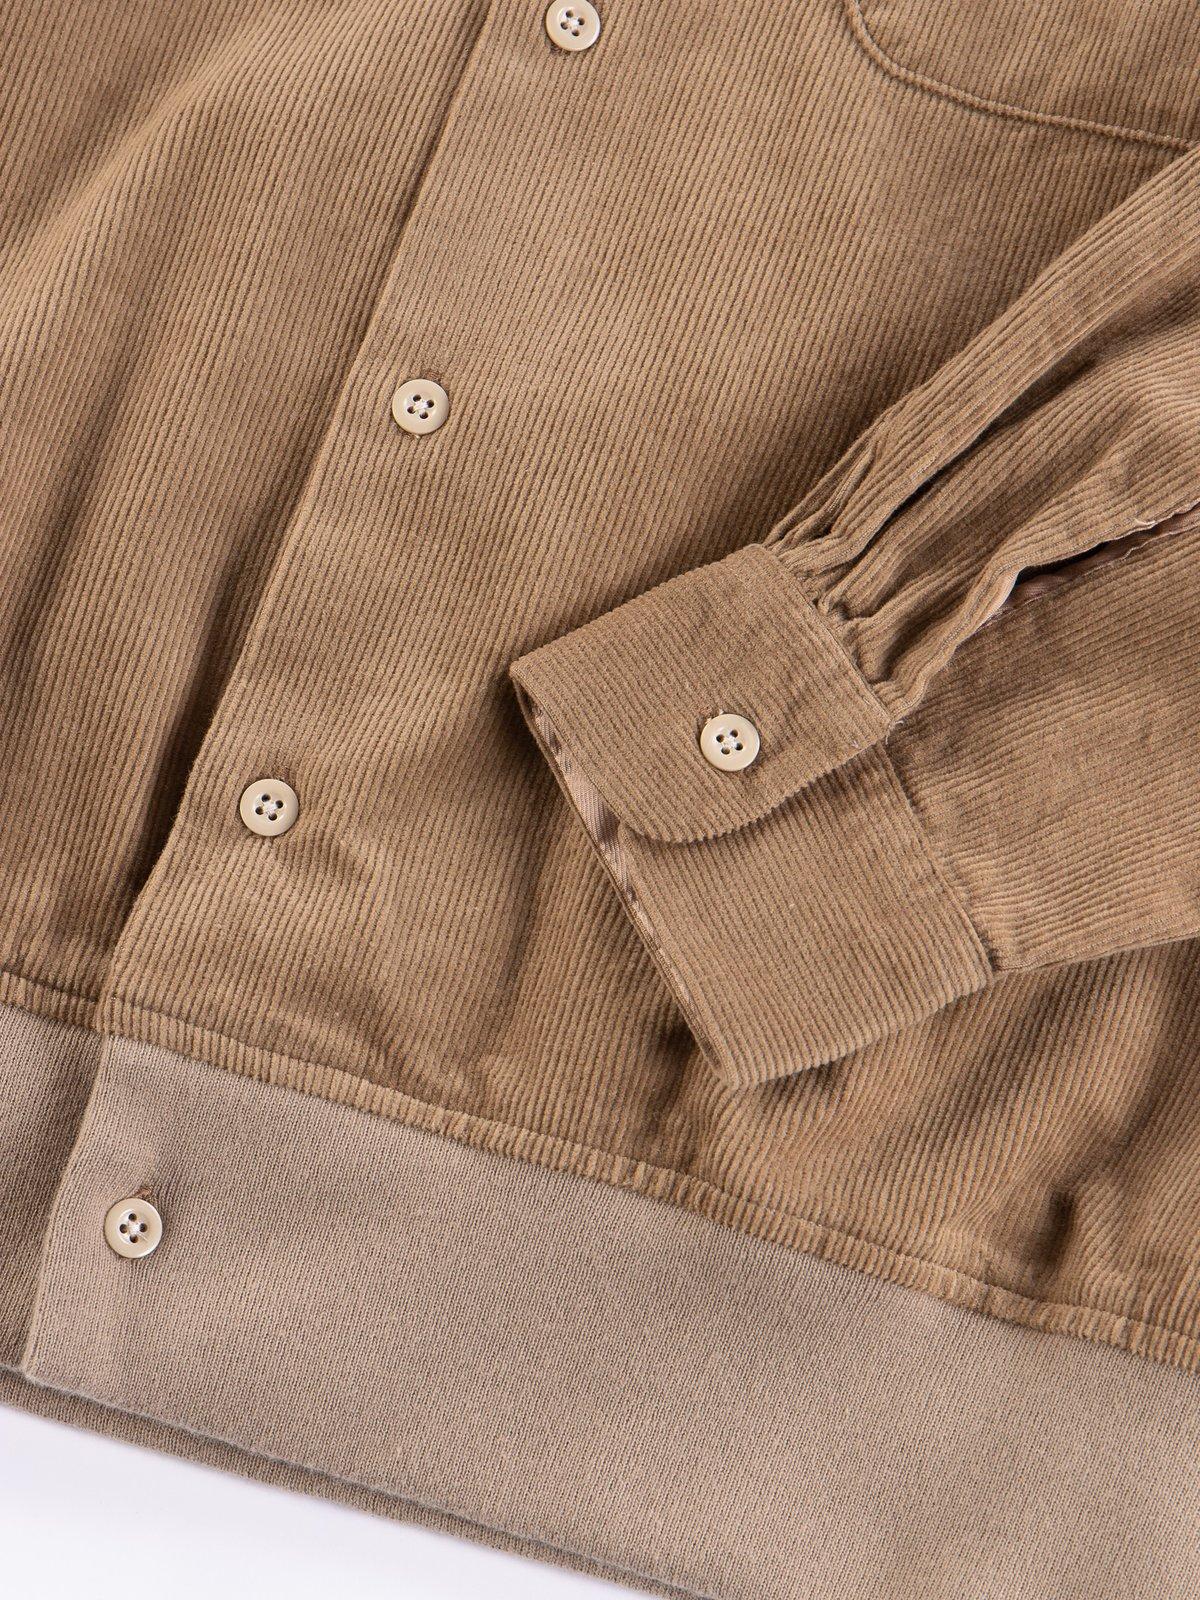 Khaki 14W Corduroy Classic Shirt - Image 5